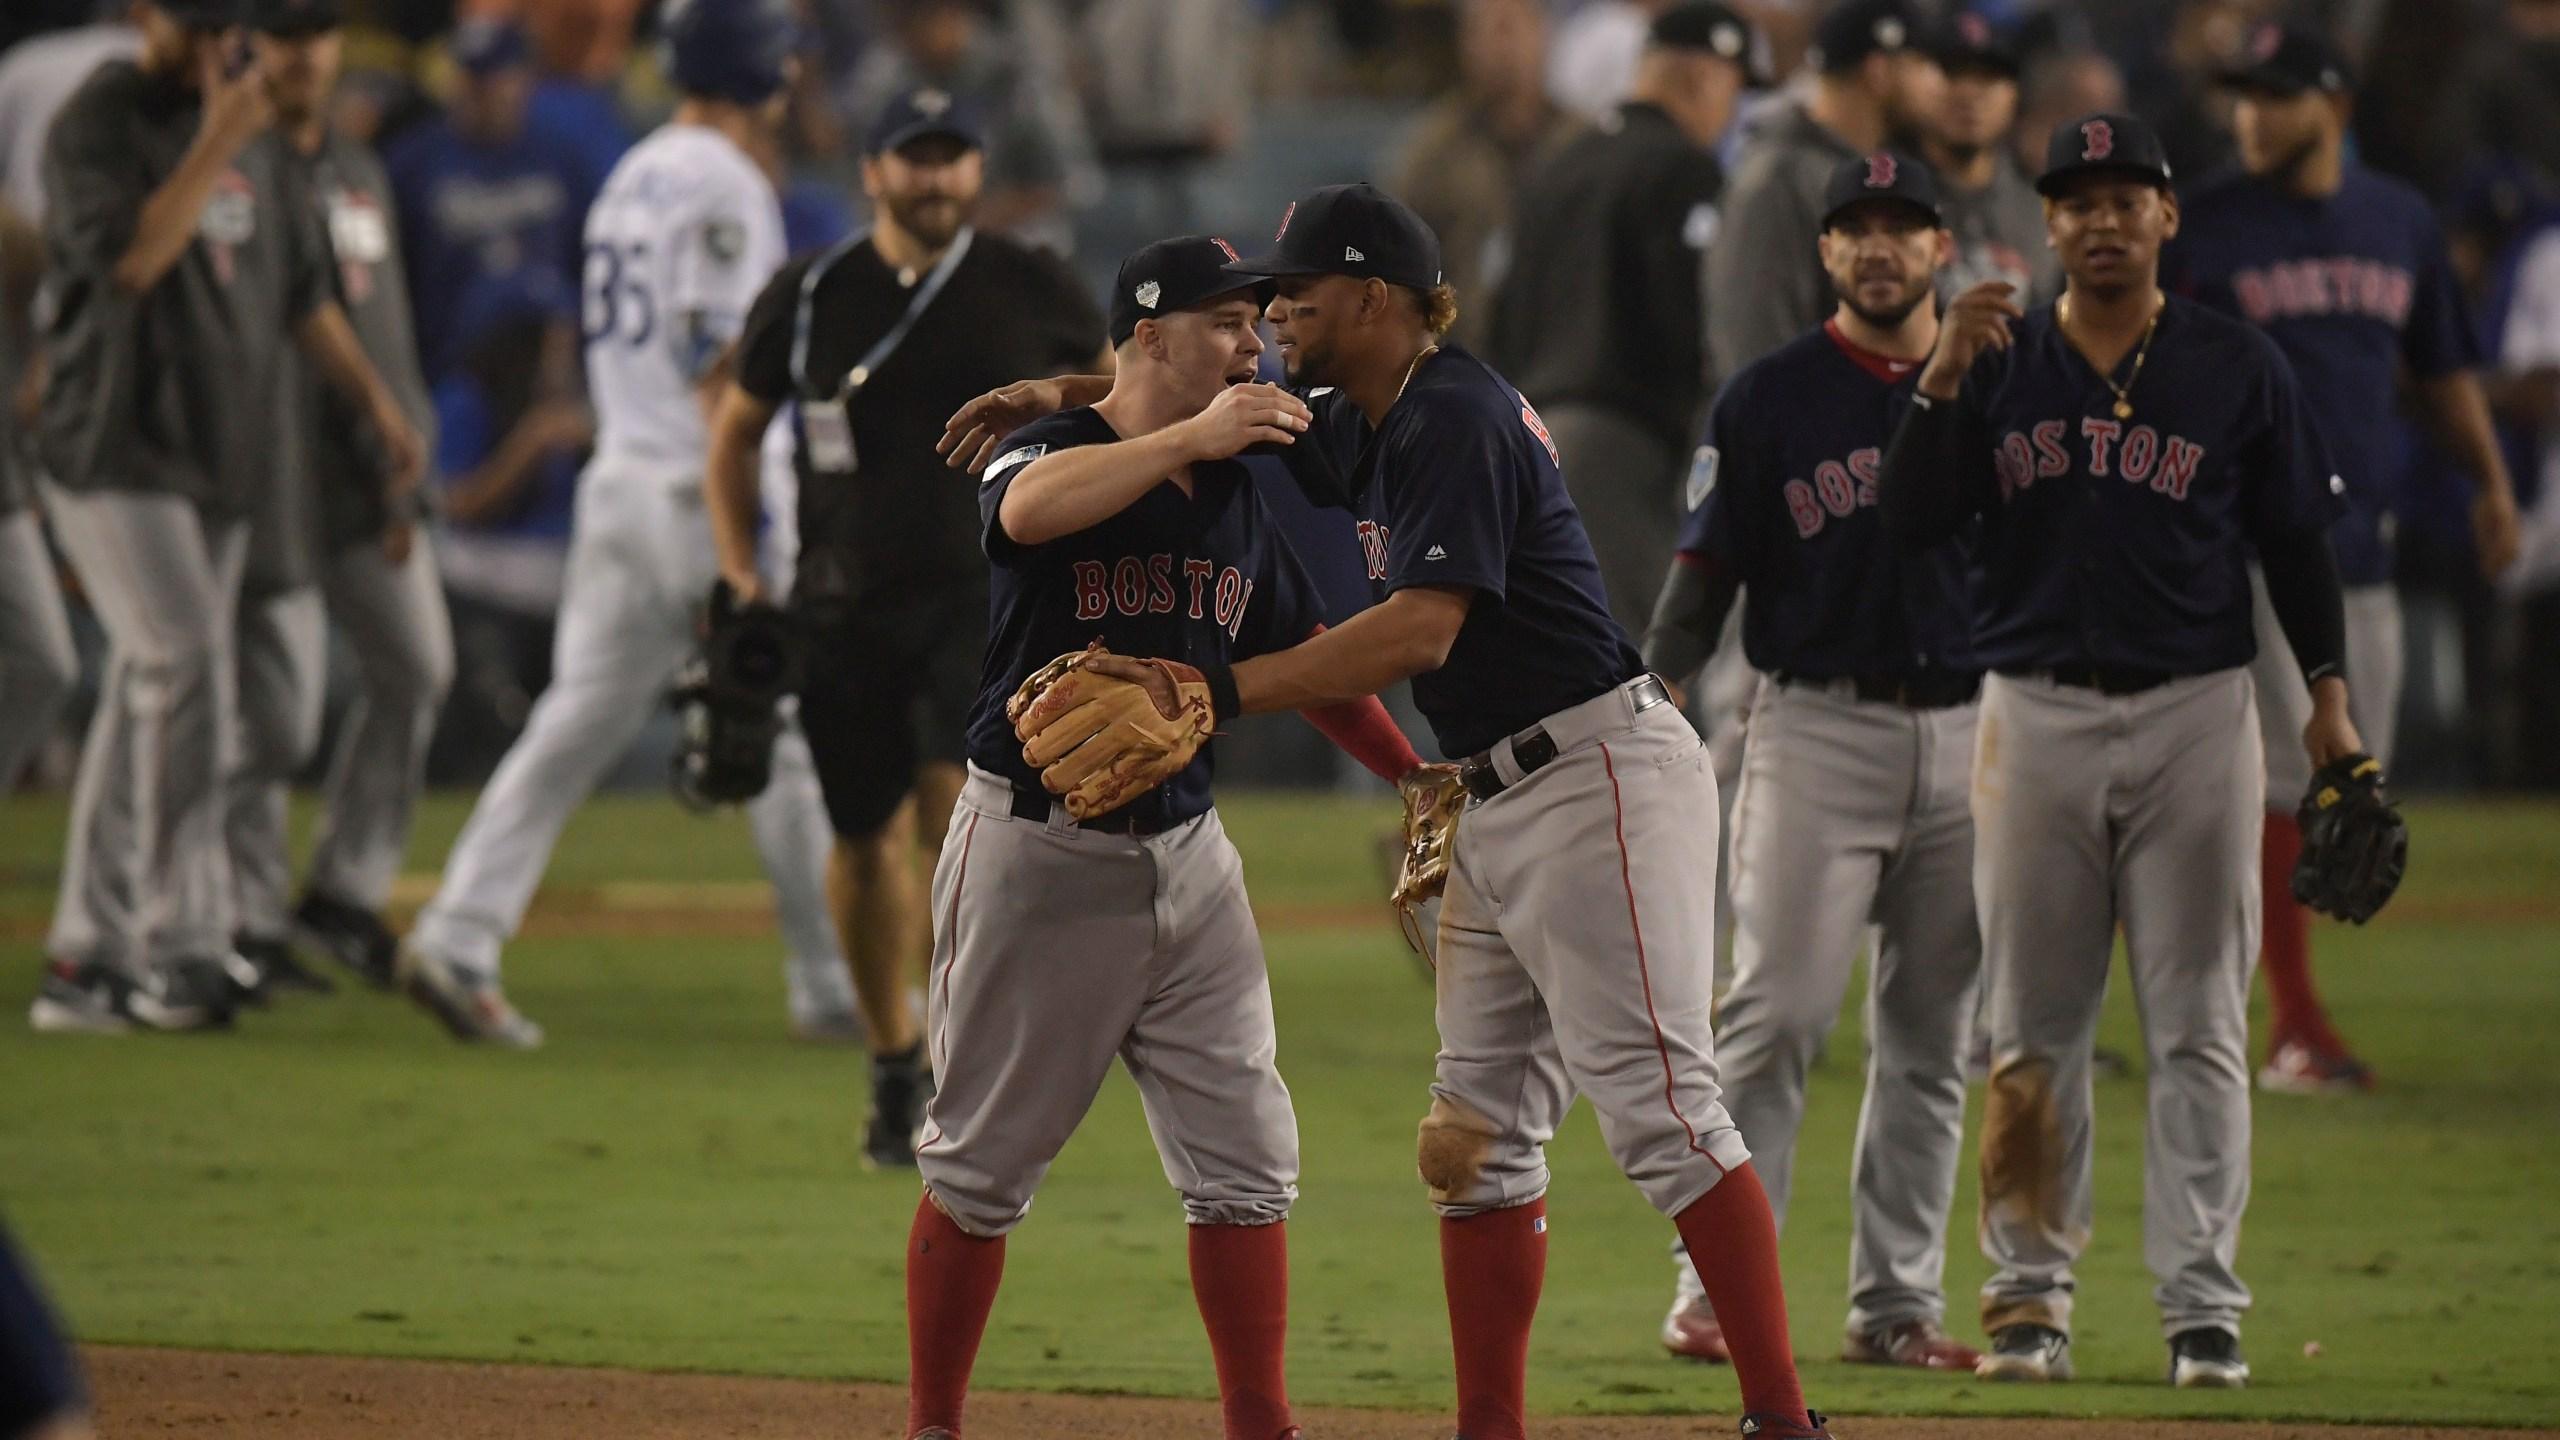 World_Series_Red_Sox_Dodgers_Baseball_26051-159532.jpg47892358